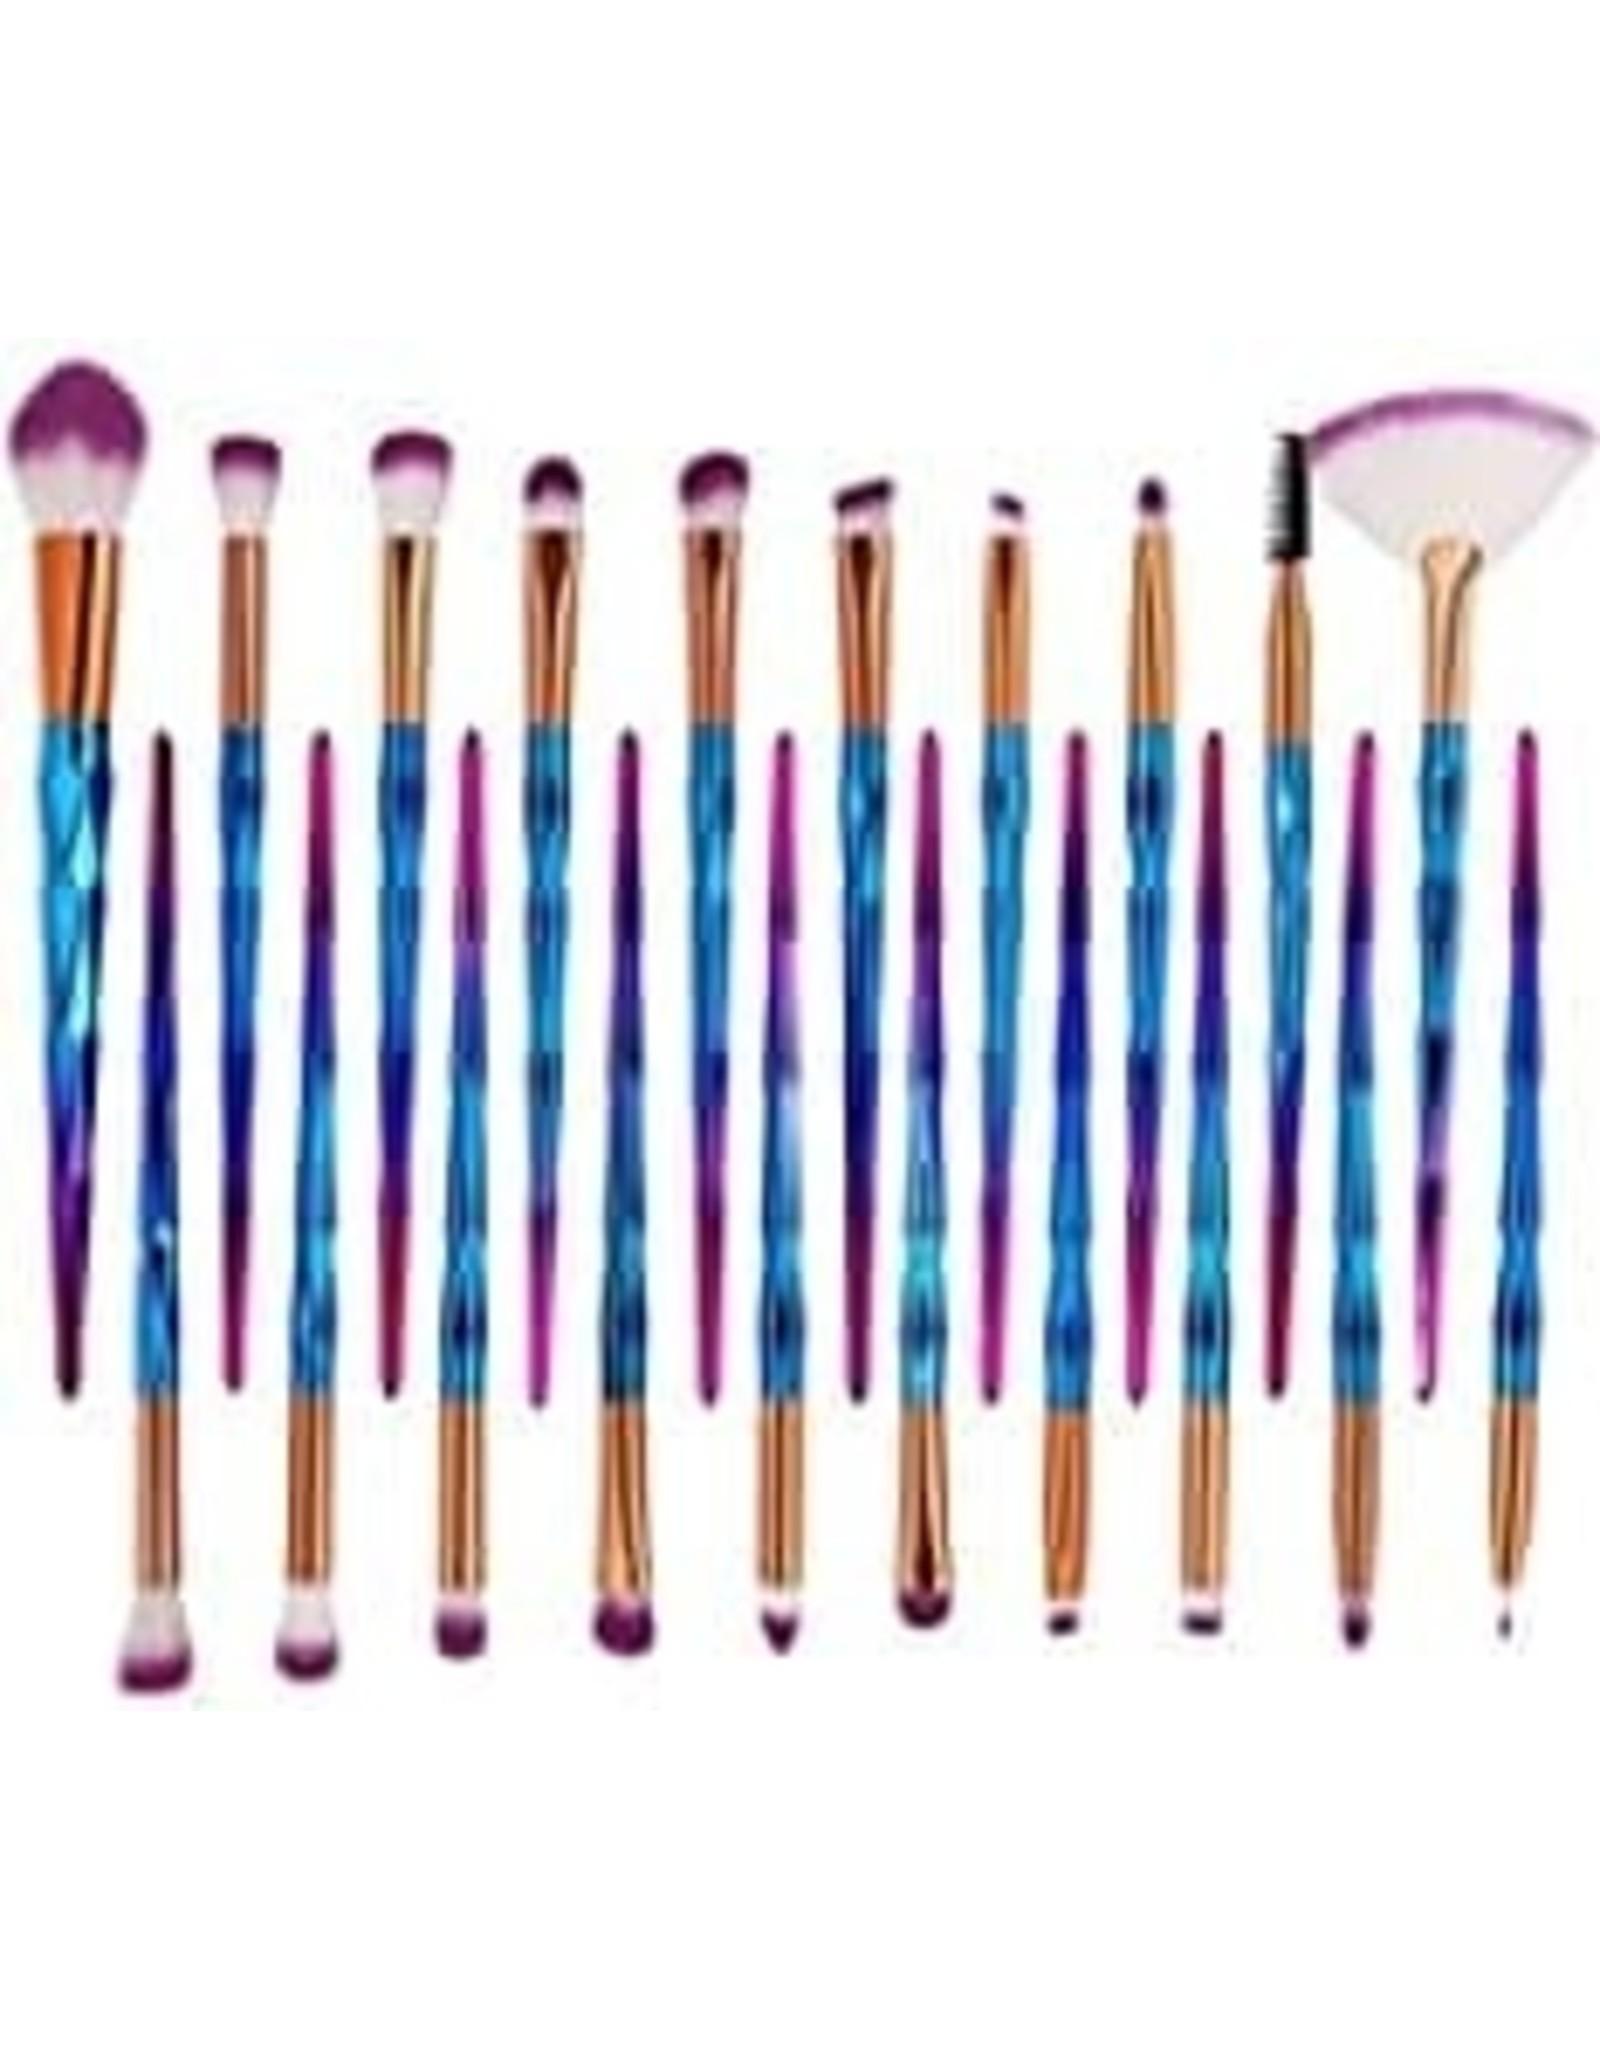 Make-Up Brushes Set of 20